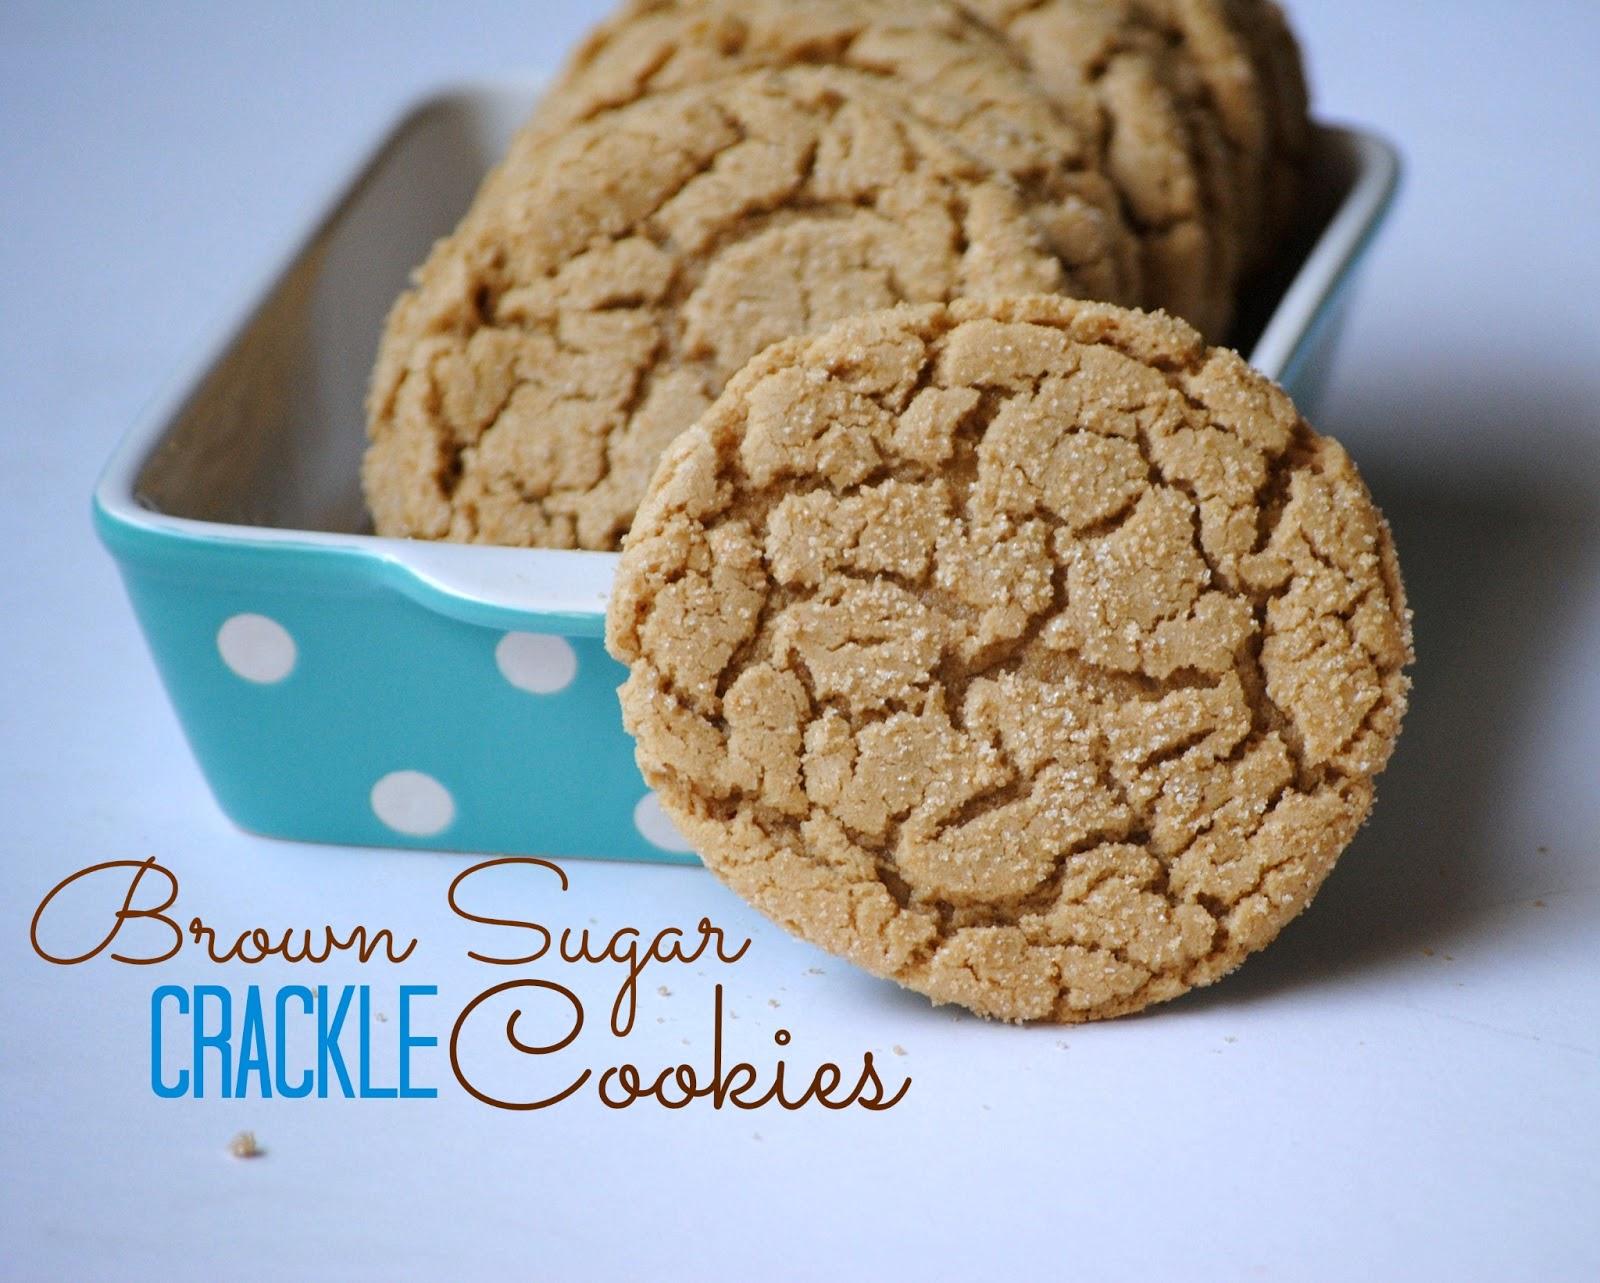 The Farm Girl Recipes: Brown Sugar Crackle Cookies